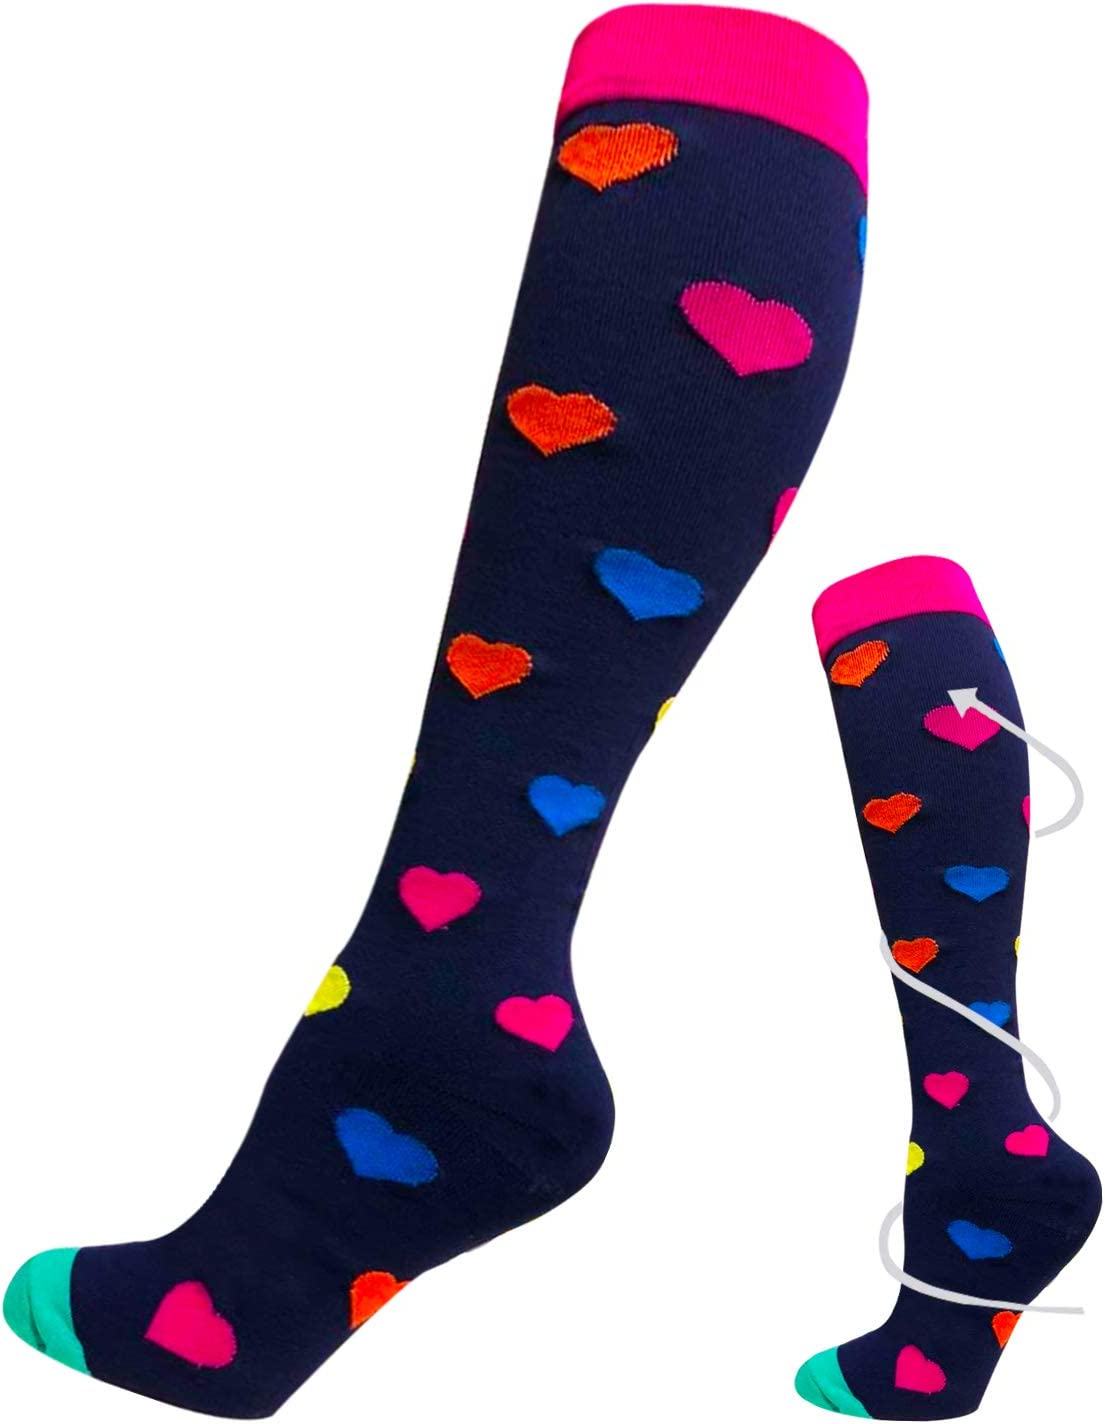 Nurses,Edema Travel ACTINPUT Compression Socks for Women /& Men 20-25 mmHg is Best Athletic Running Flight